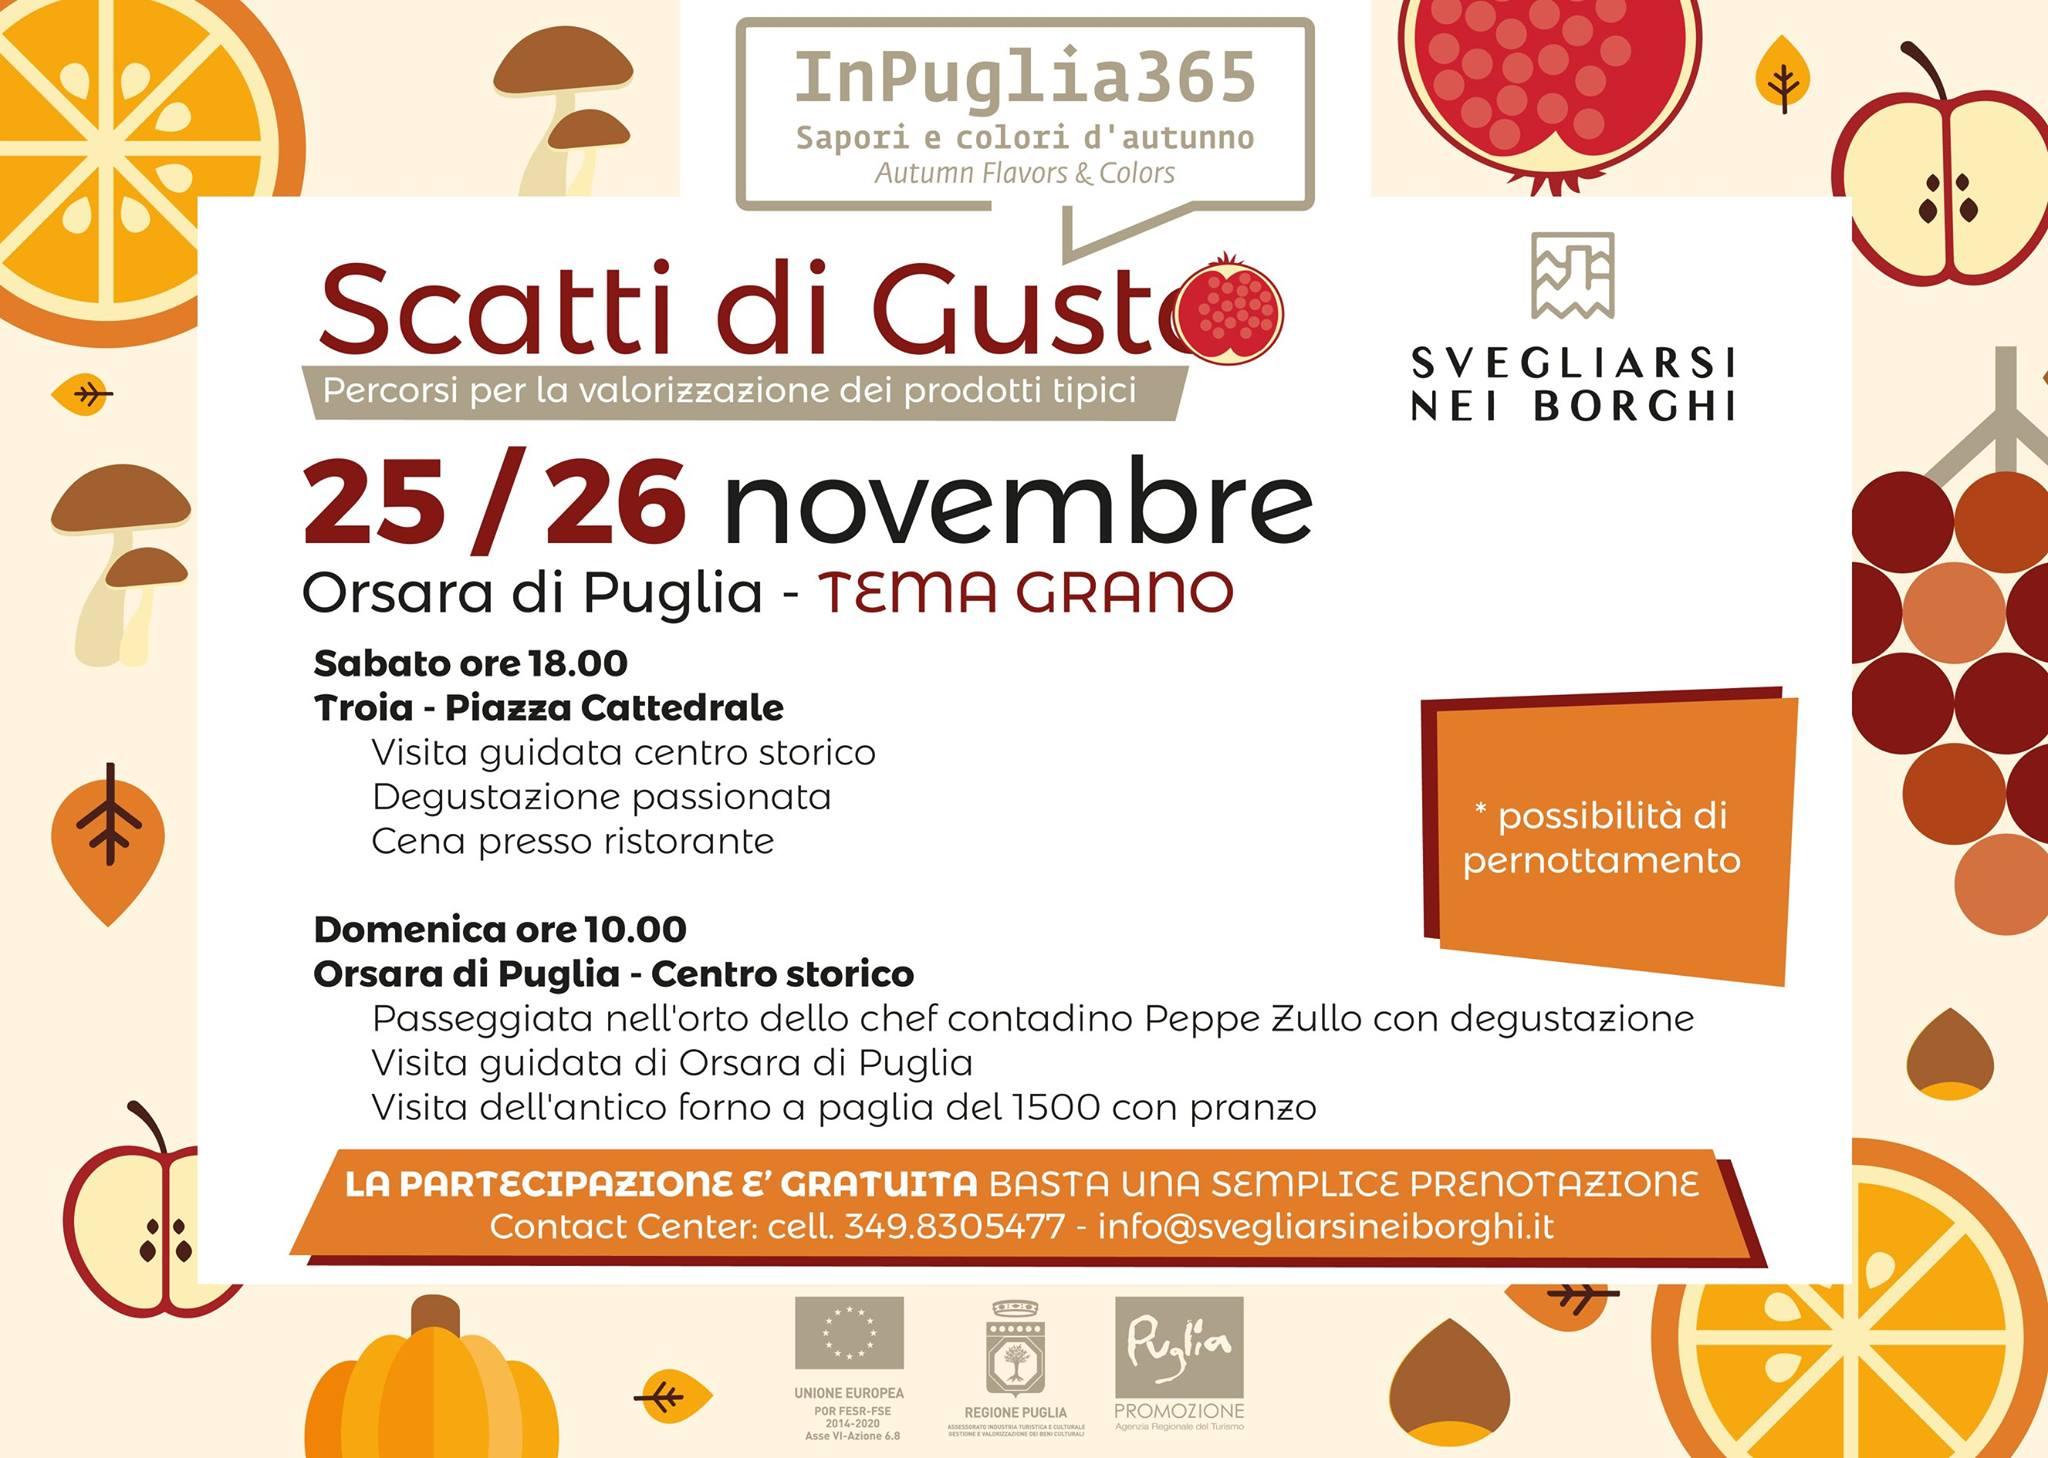 Una domenica di sapori a Orsara di Puglia